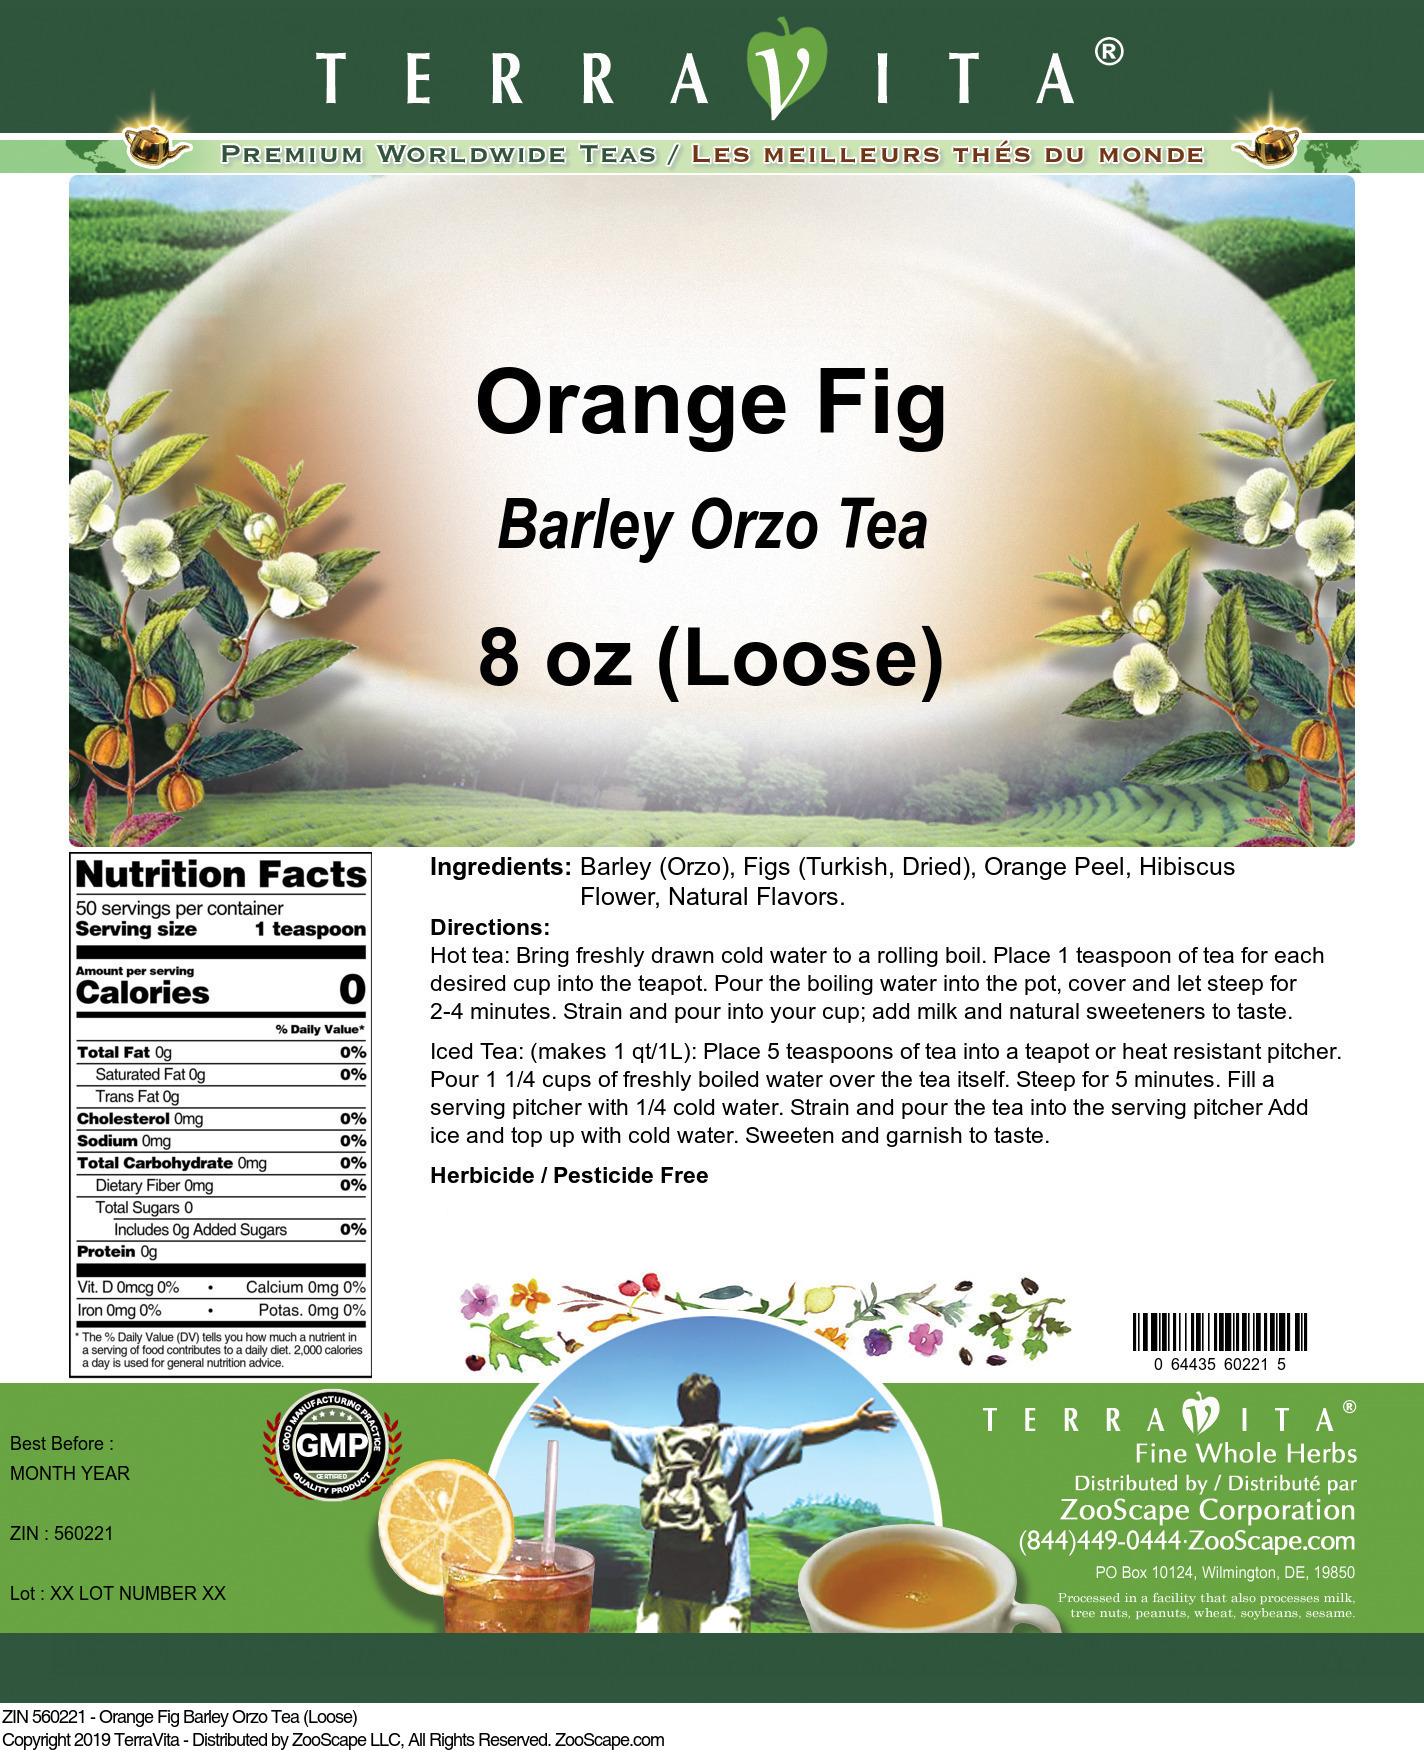 Orange Fig Barley Orzo Tea (Loose)